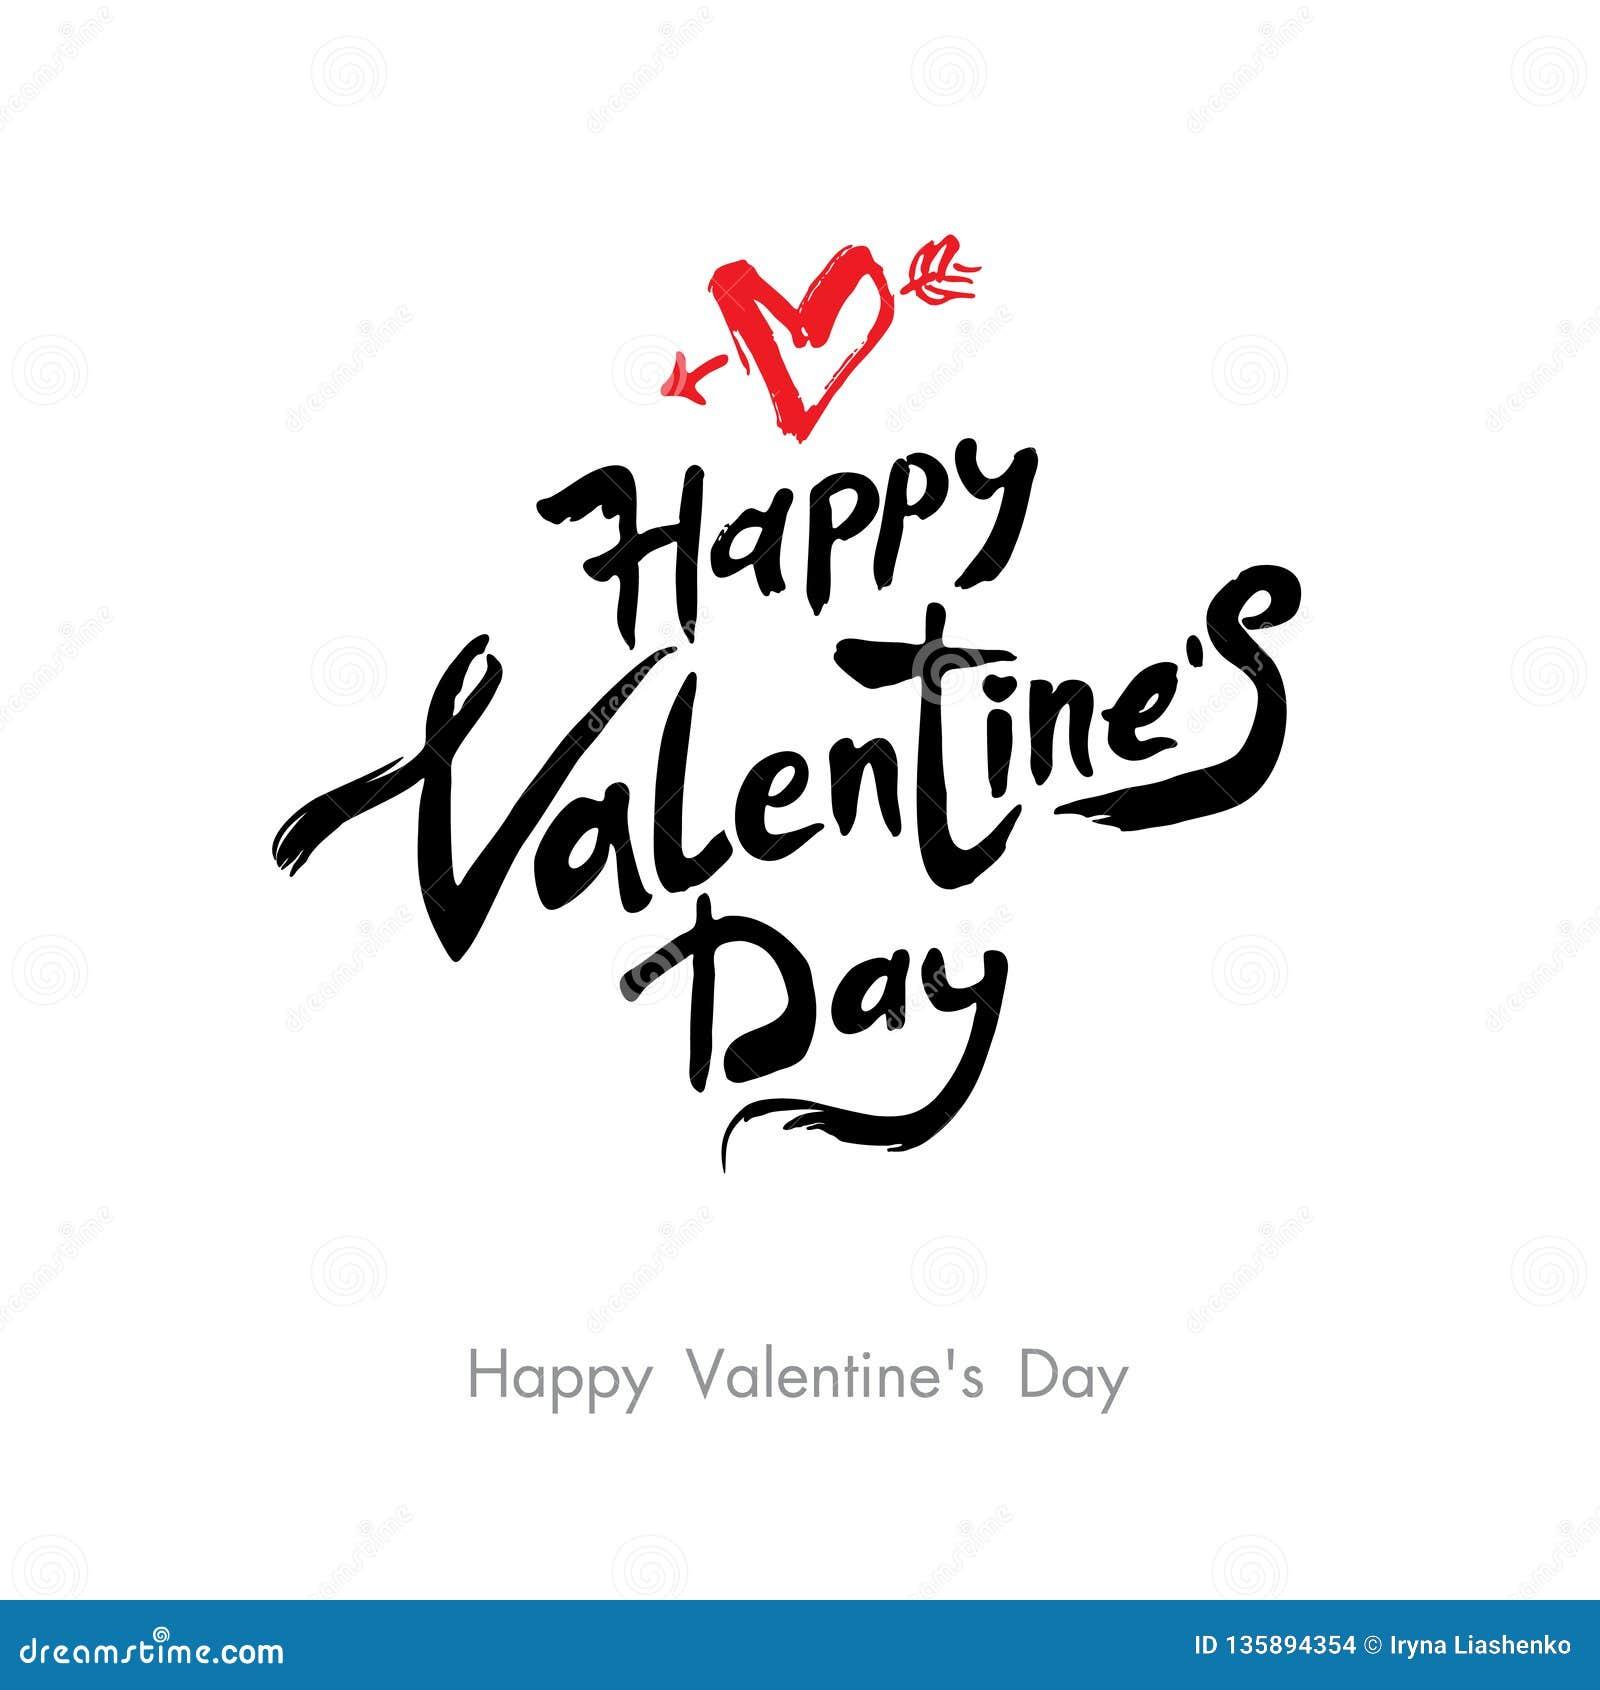 Happy Valentine`s Day modern calligraphy. Valentines day holidays typography. Handwritten lettering.